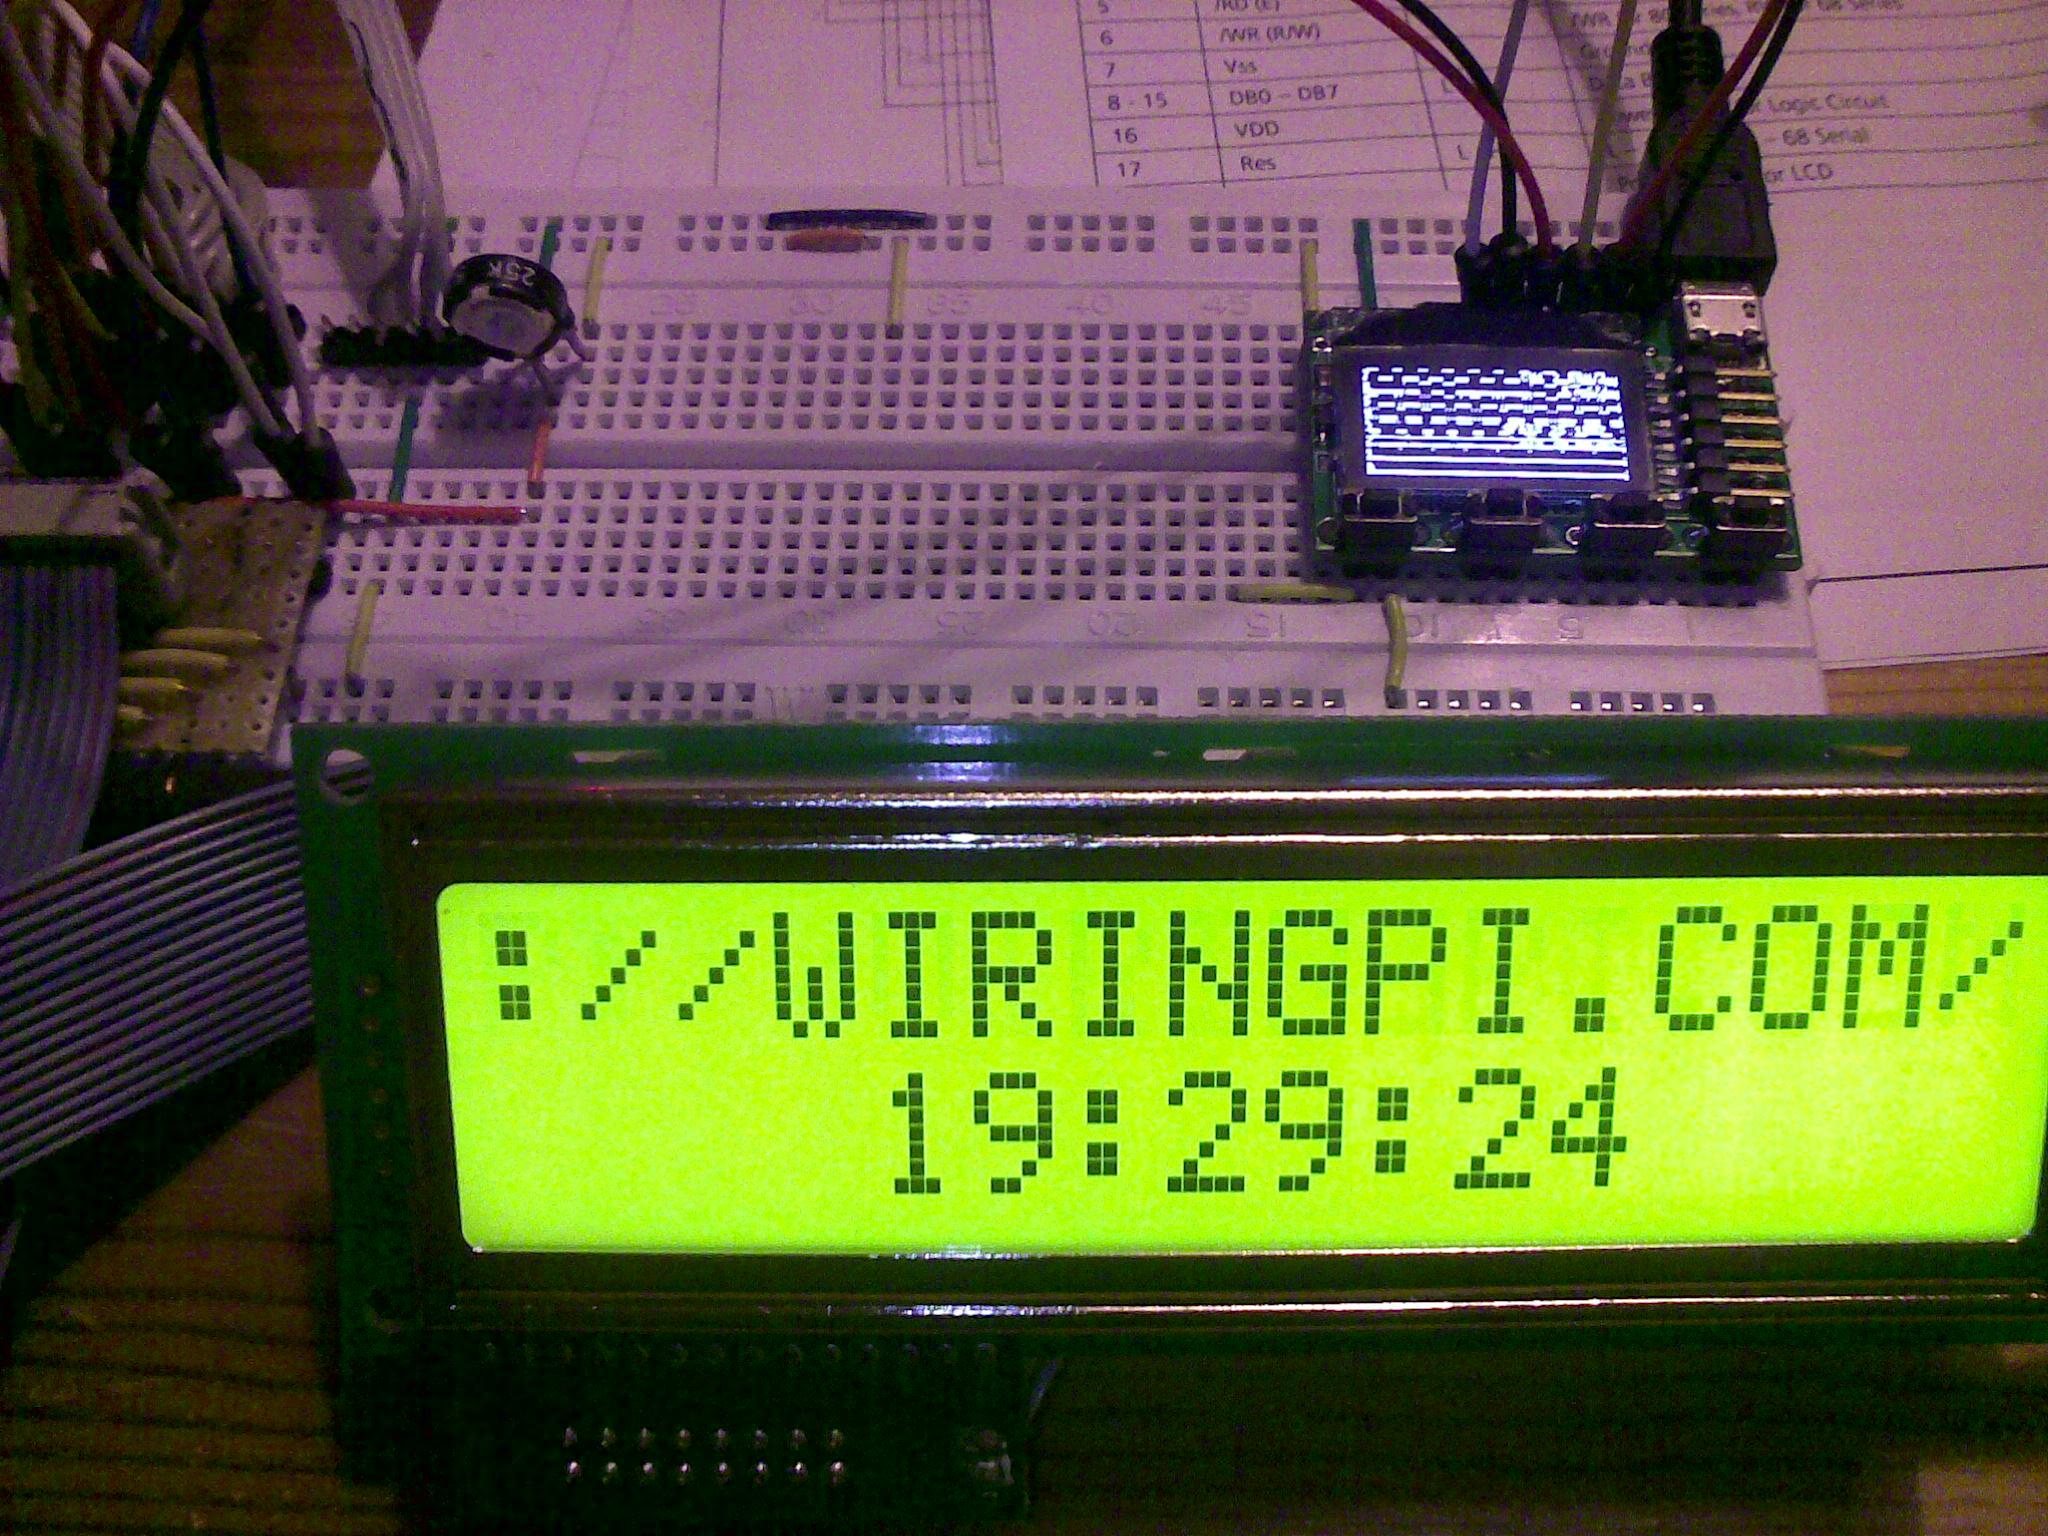 Wiringpi Lcd Library Change Your Idea With Wiring Diagram Design Gpio Export 16 U00d72 An Banana Pi Anschlie U00dfen Pinkman S Blog Raspberry B Pinout